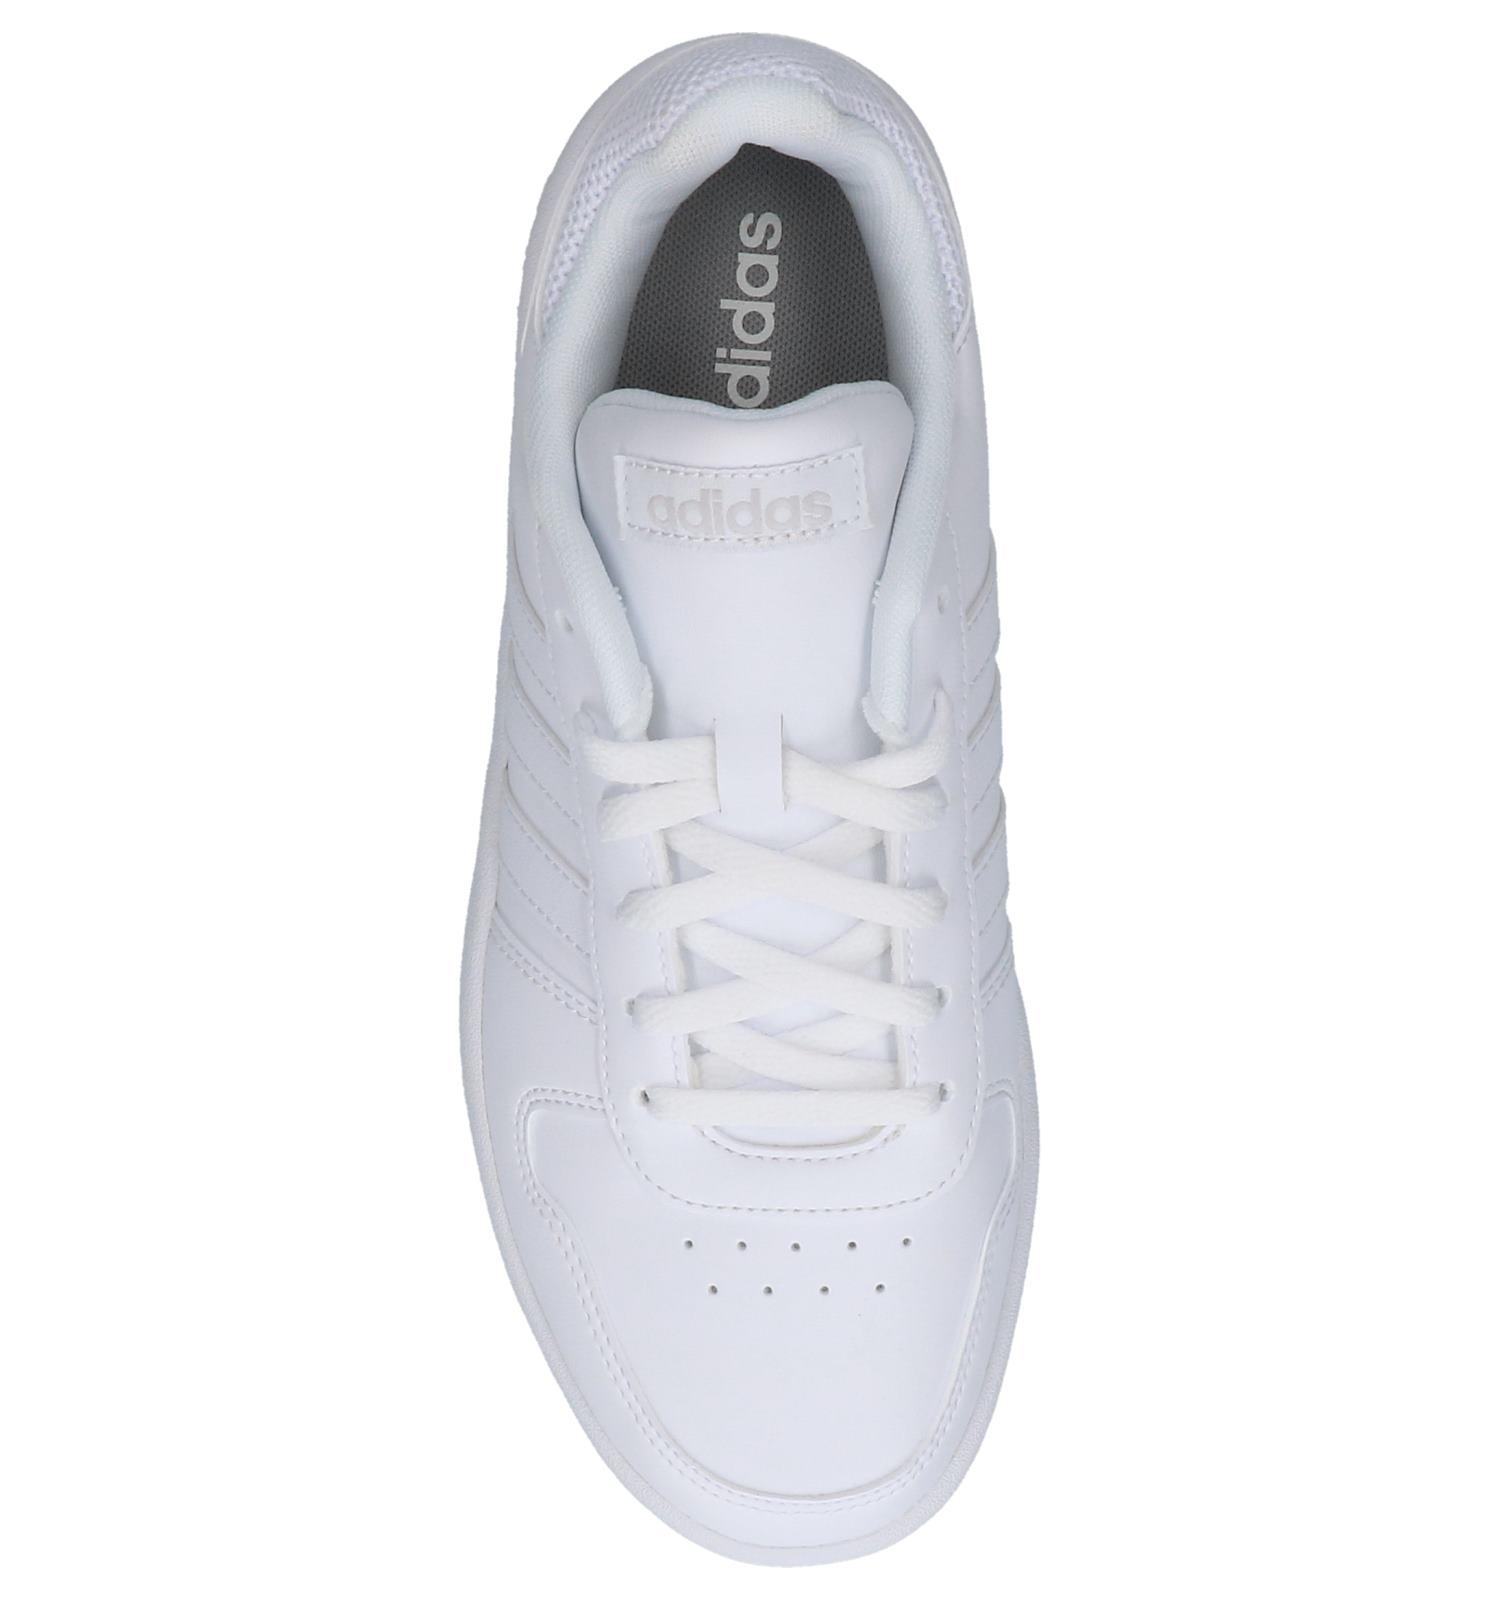 Witte Sneakers adidas Hoops 2.0 | SCHOENENTORFS.NL | Gratis